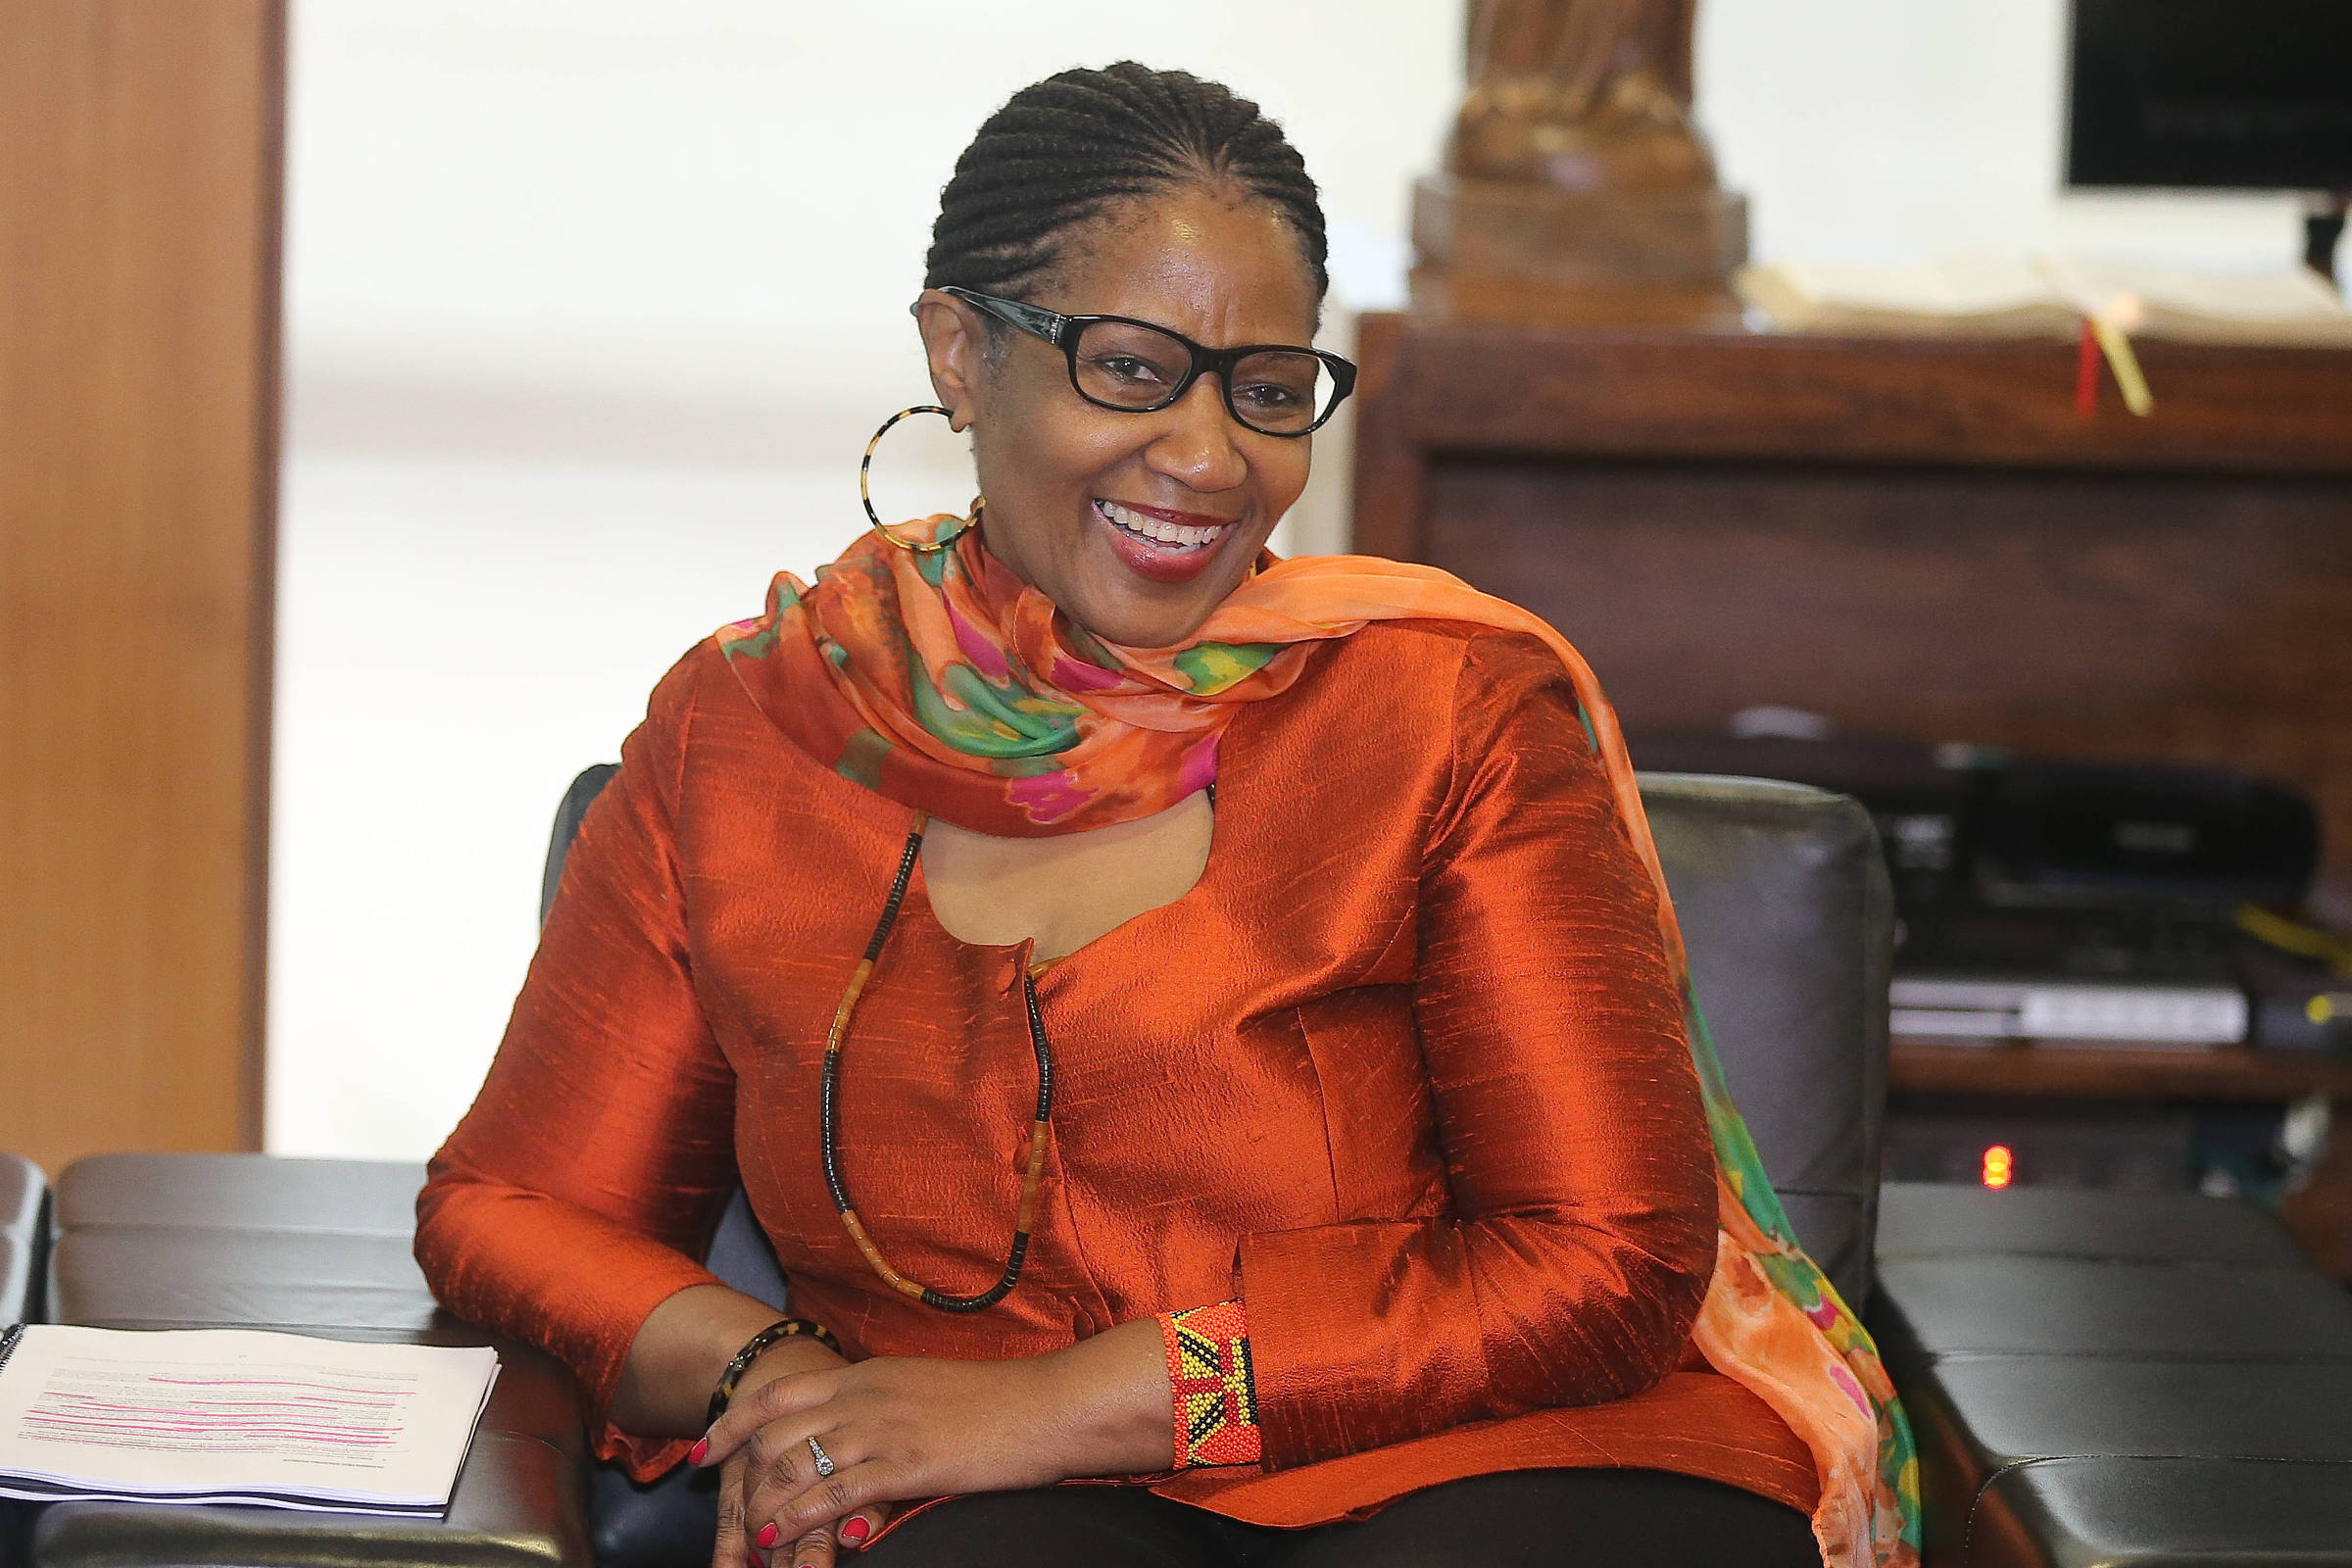 A diretora-executiva da ONU Mulheres Phumzile Mlambo-Ngcuka - Alan Marques - 18.nov.15/Folhapress